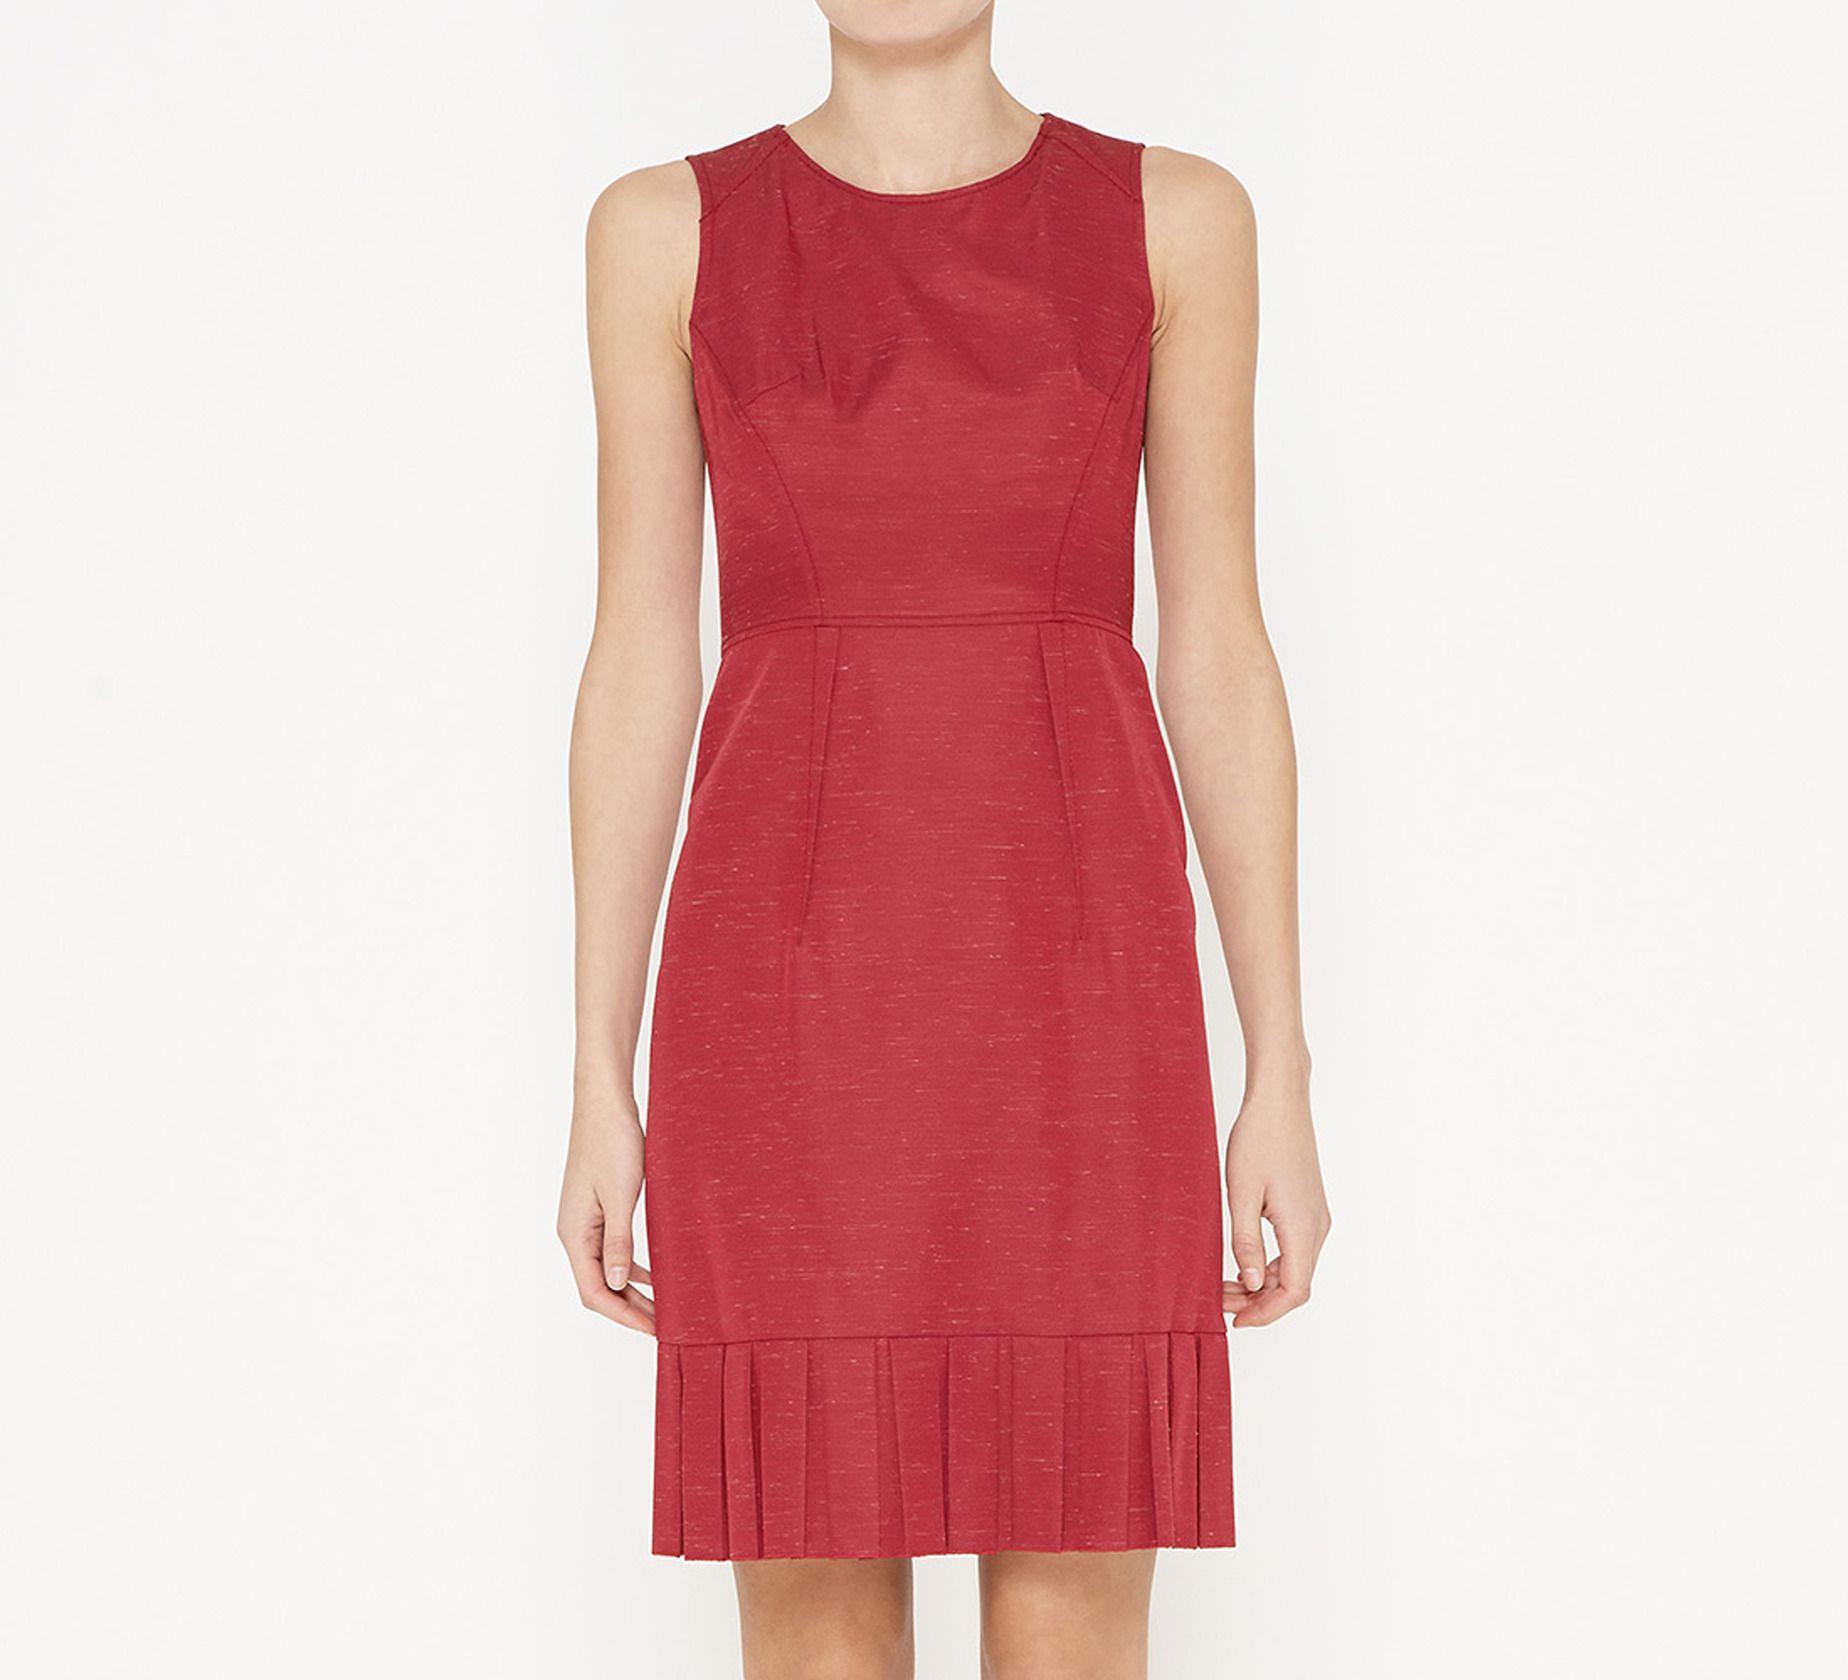 Red dress by valentino live fashionably pinterest valentino